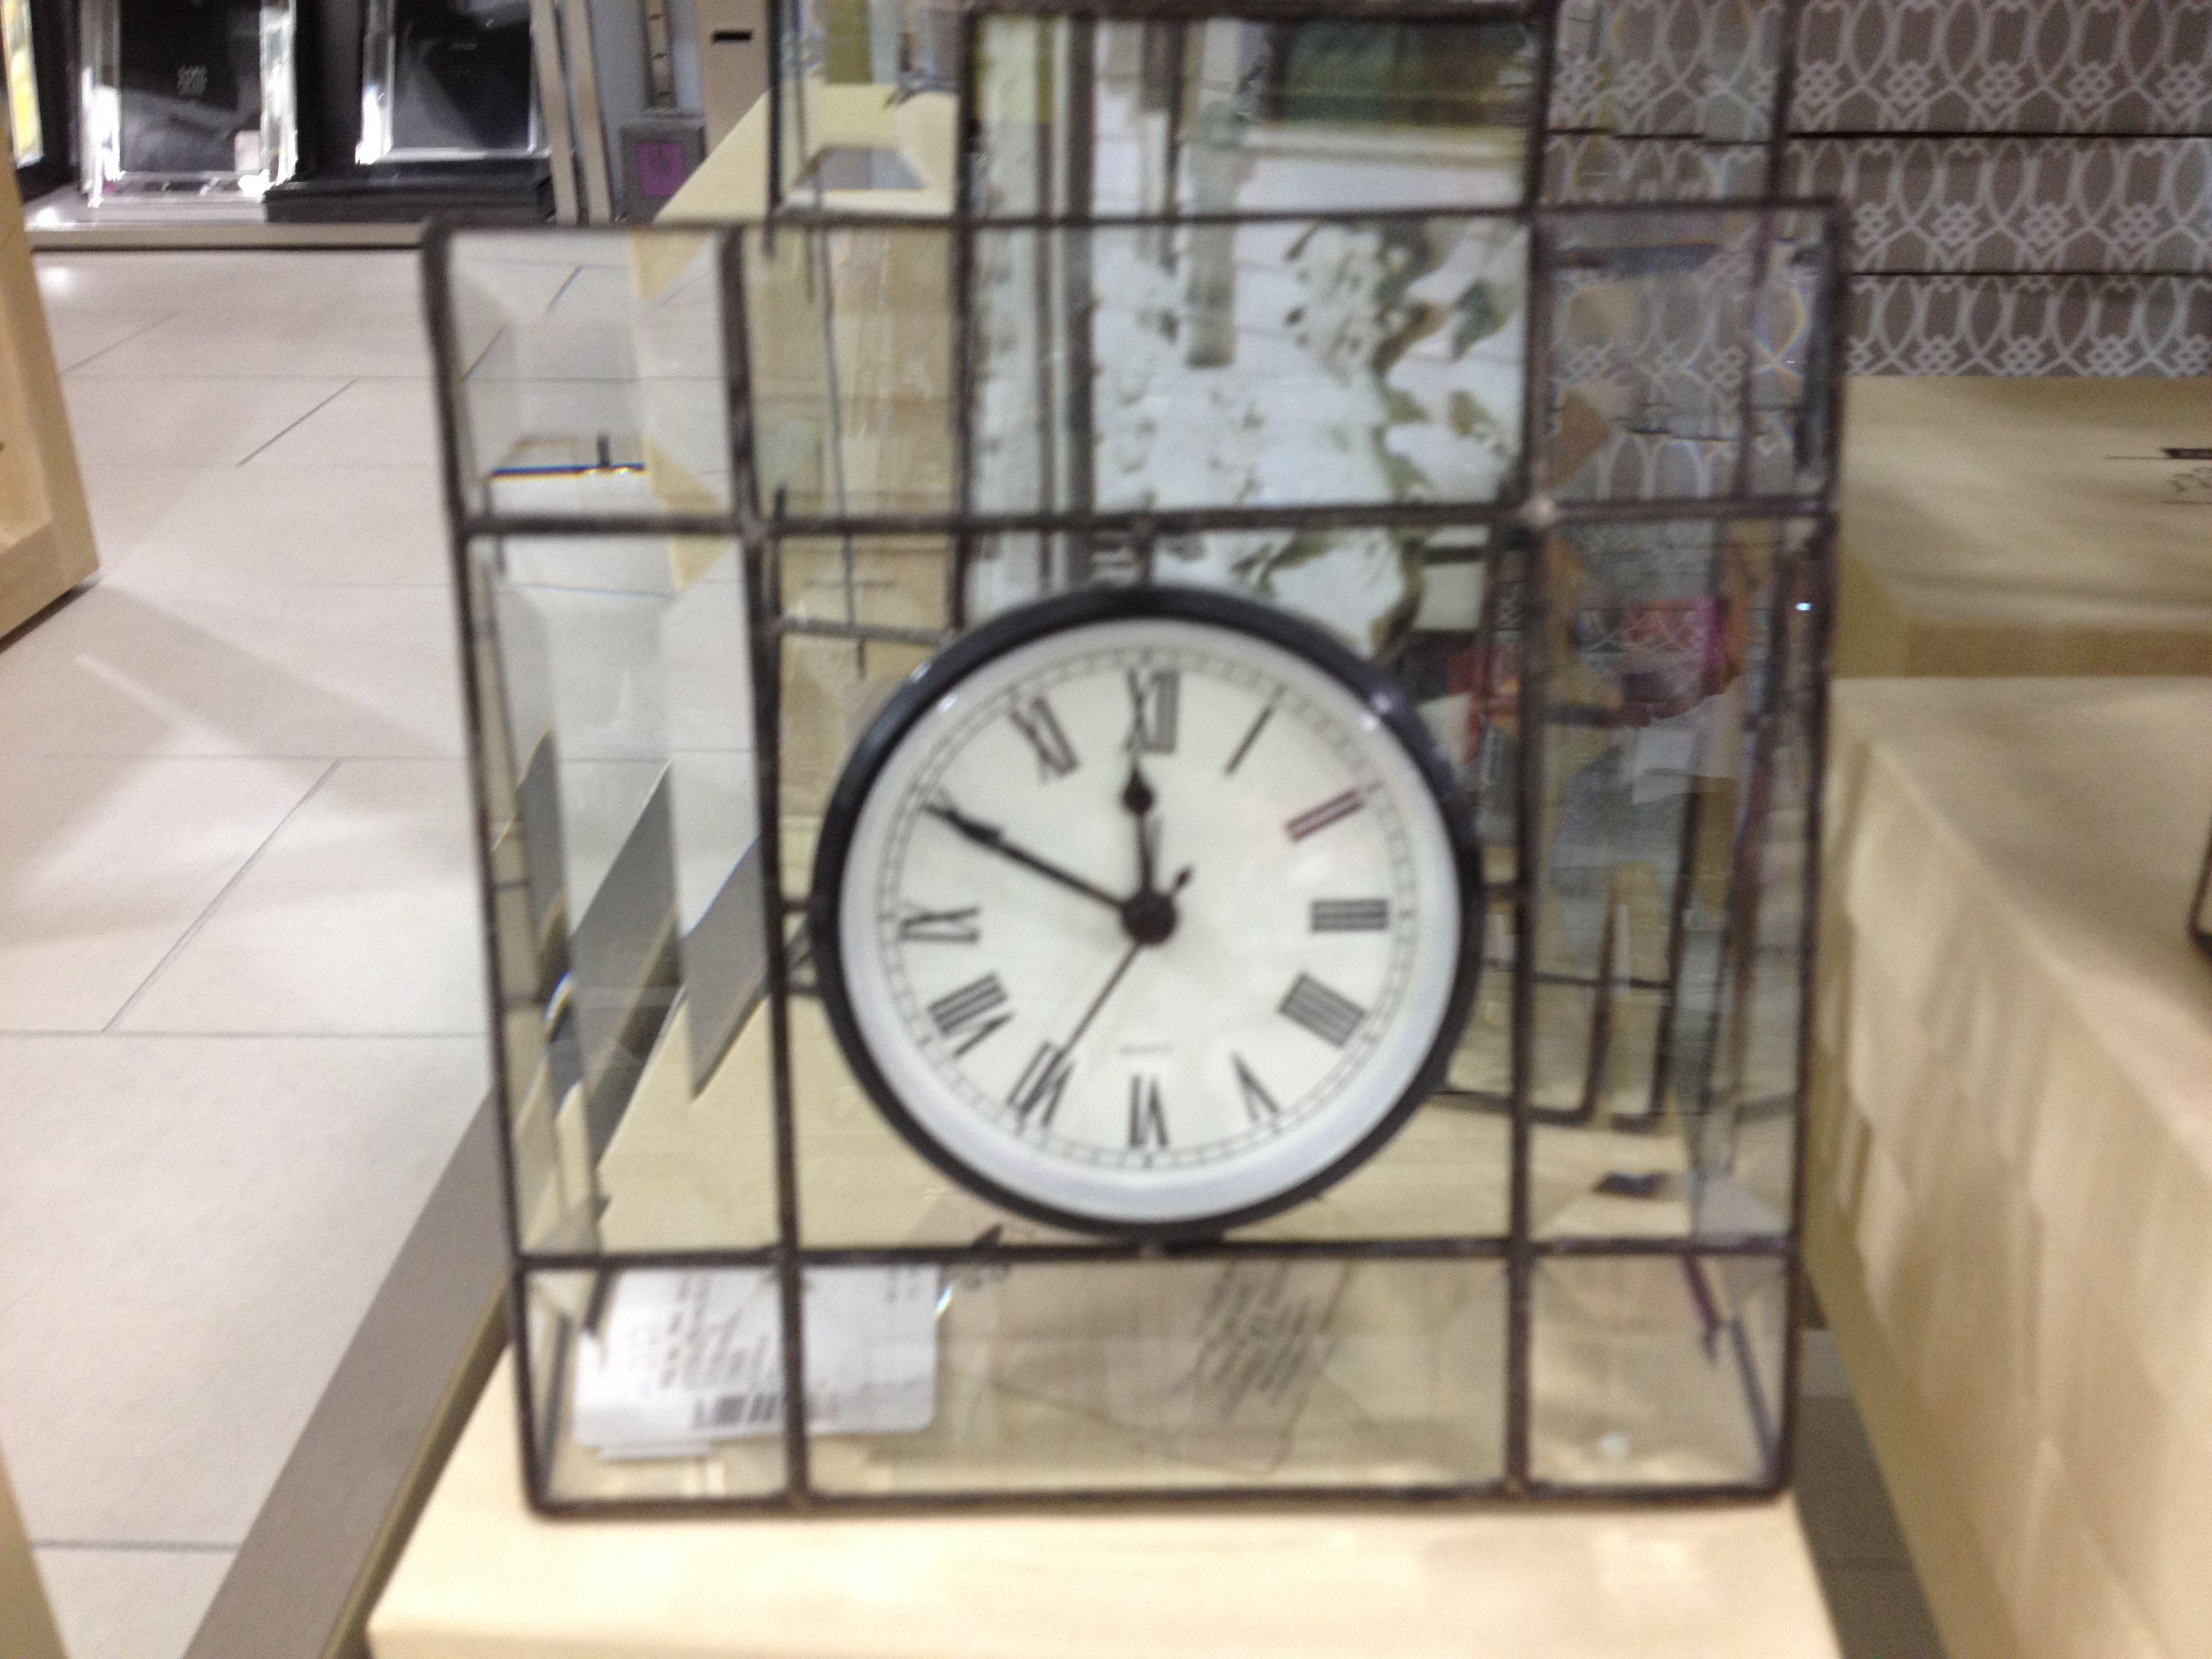 Clock in glass frame.